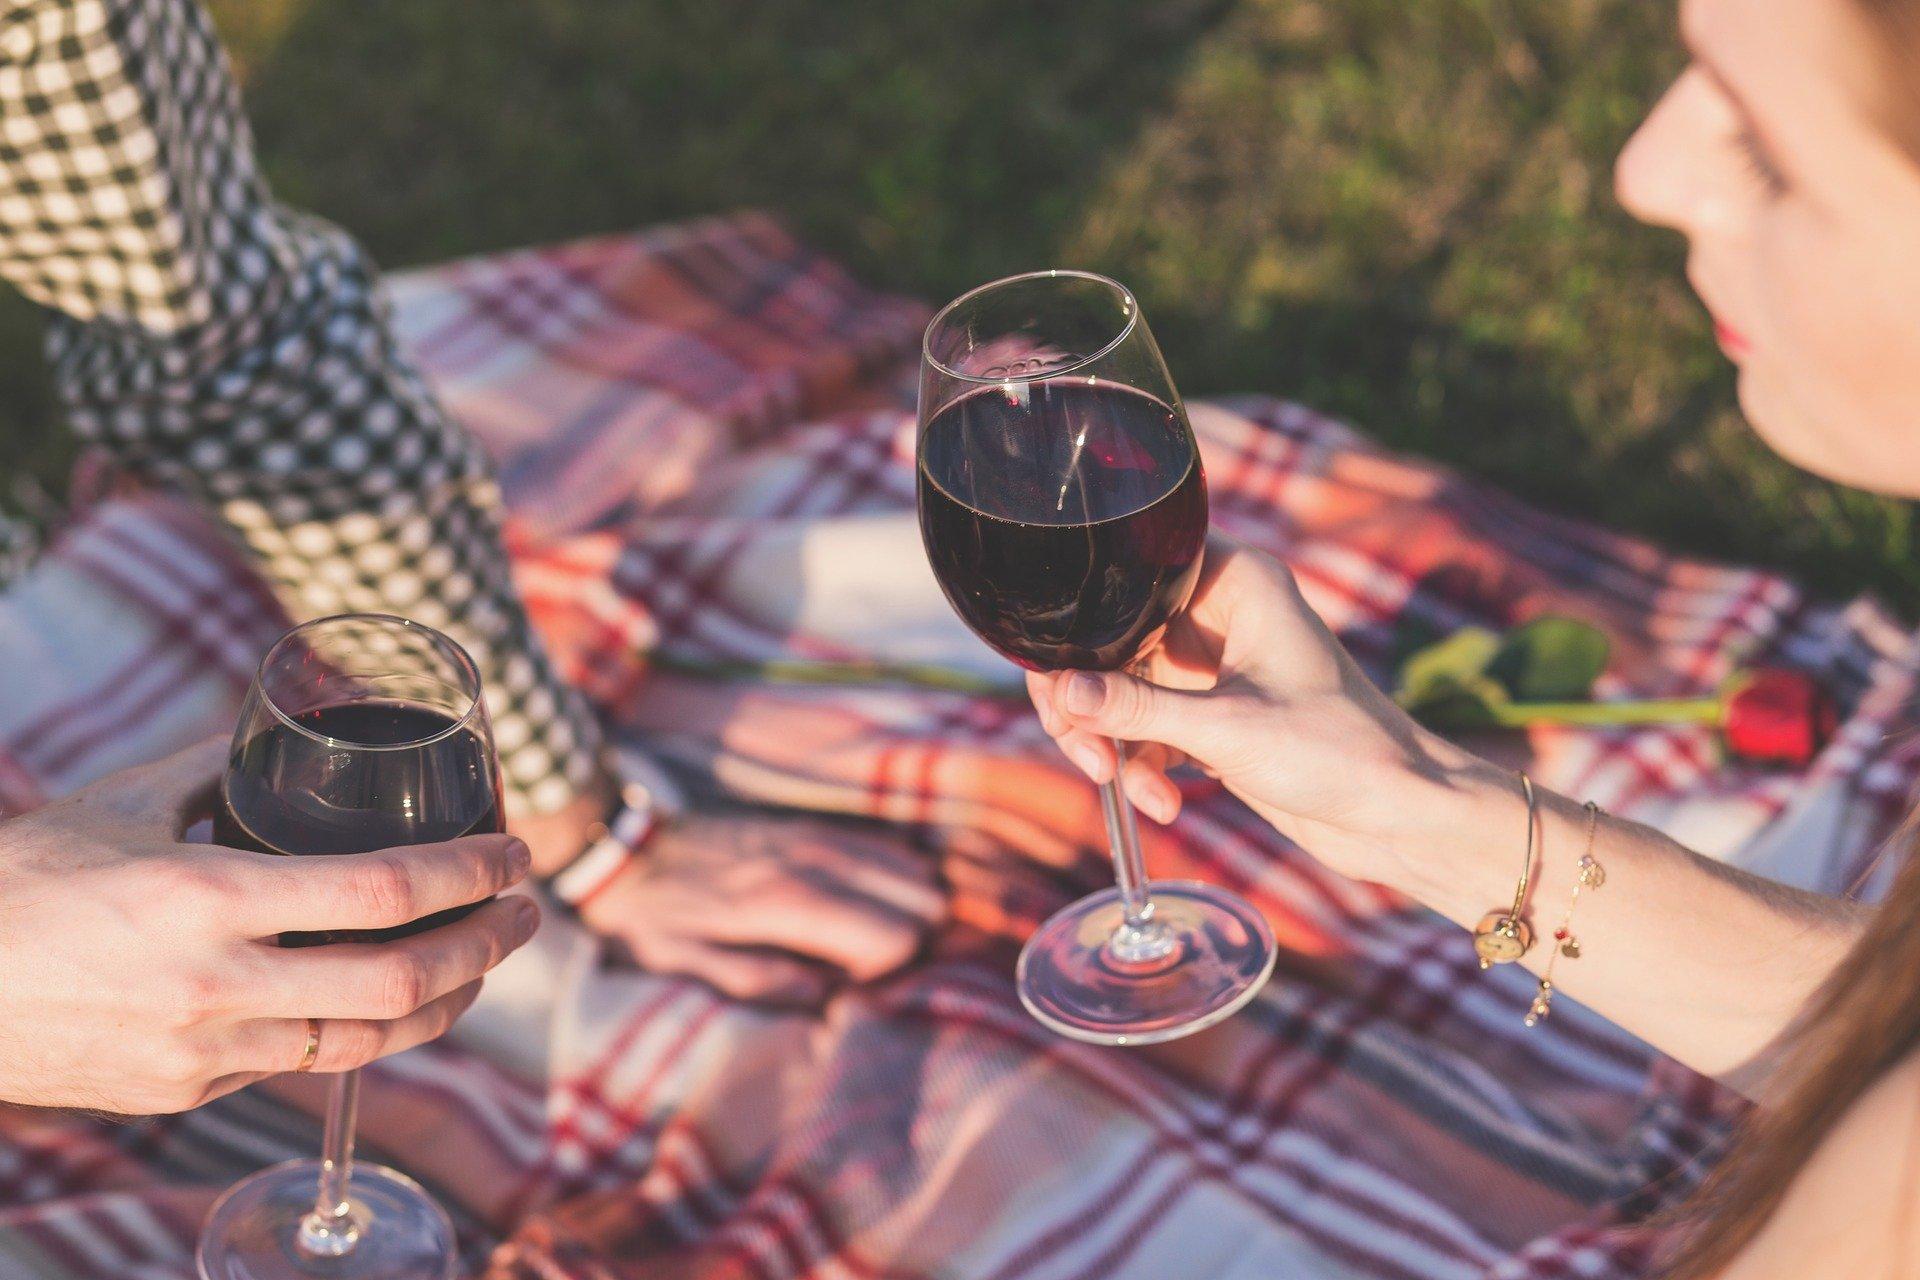 Castelli romani wines